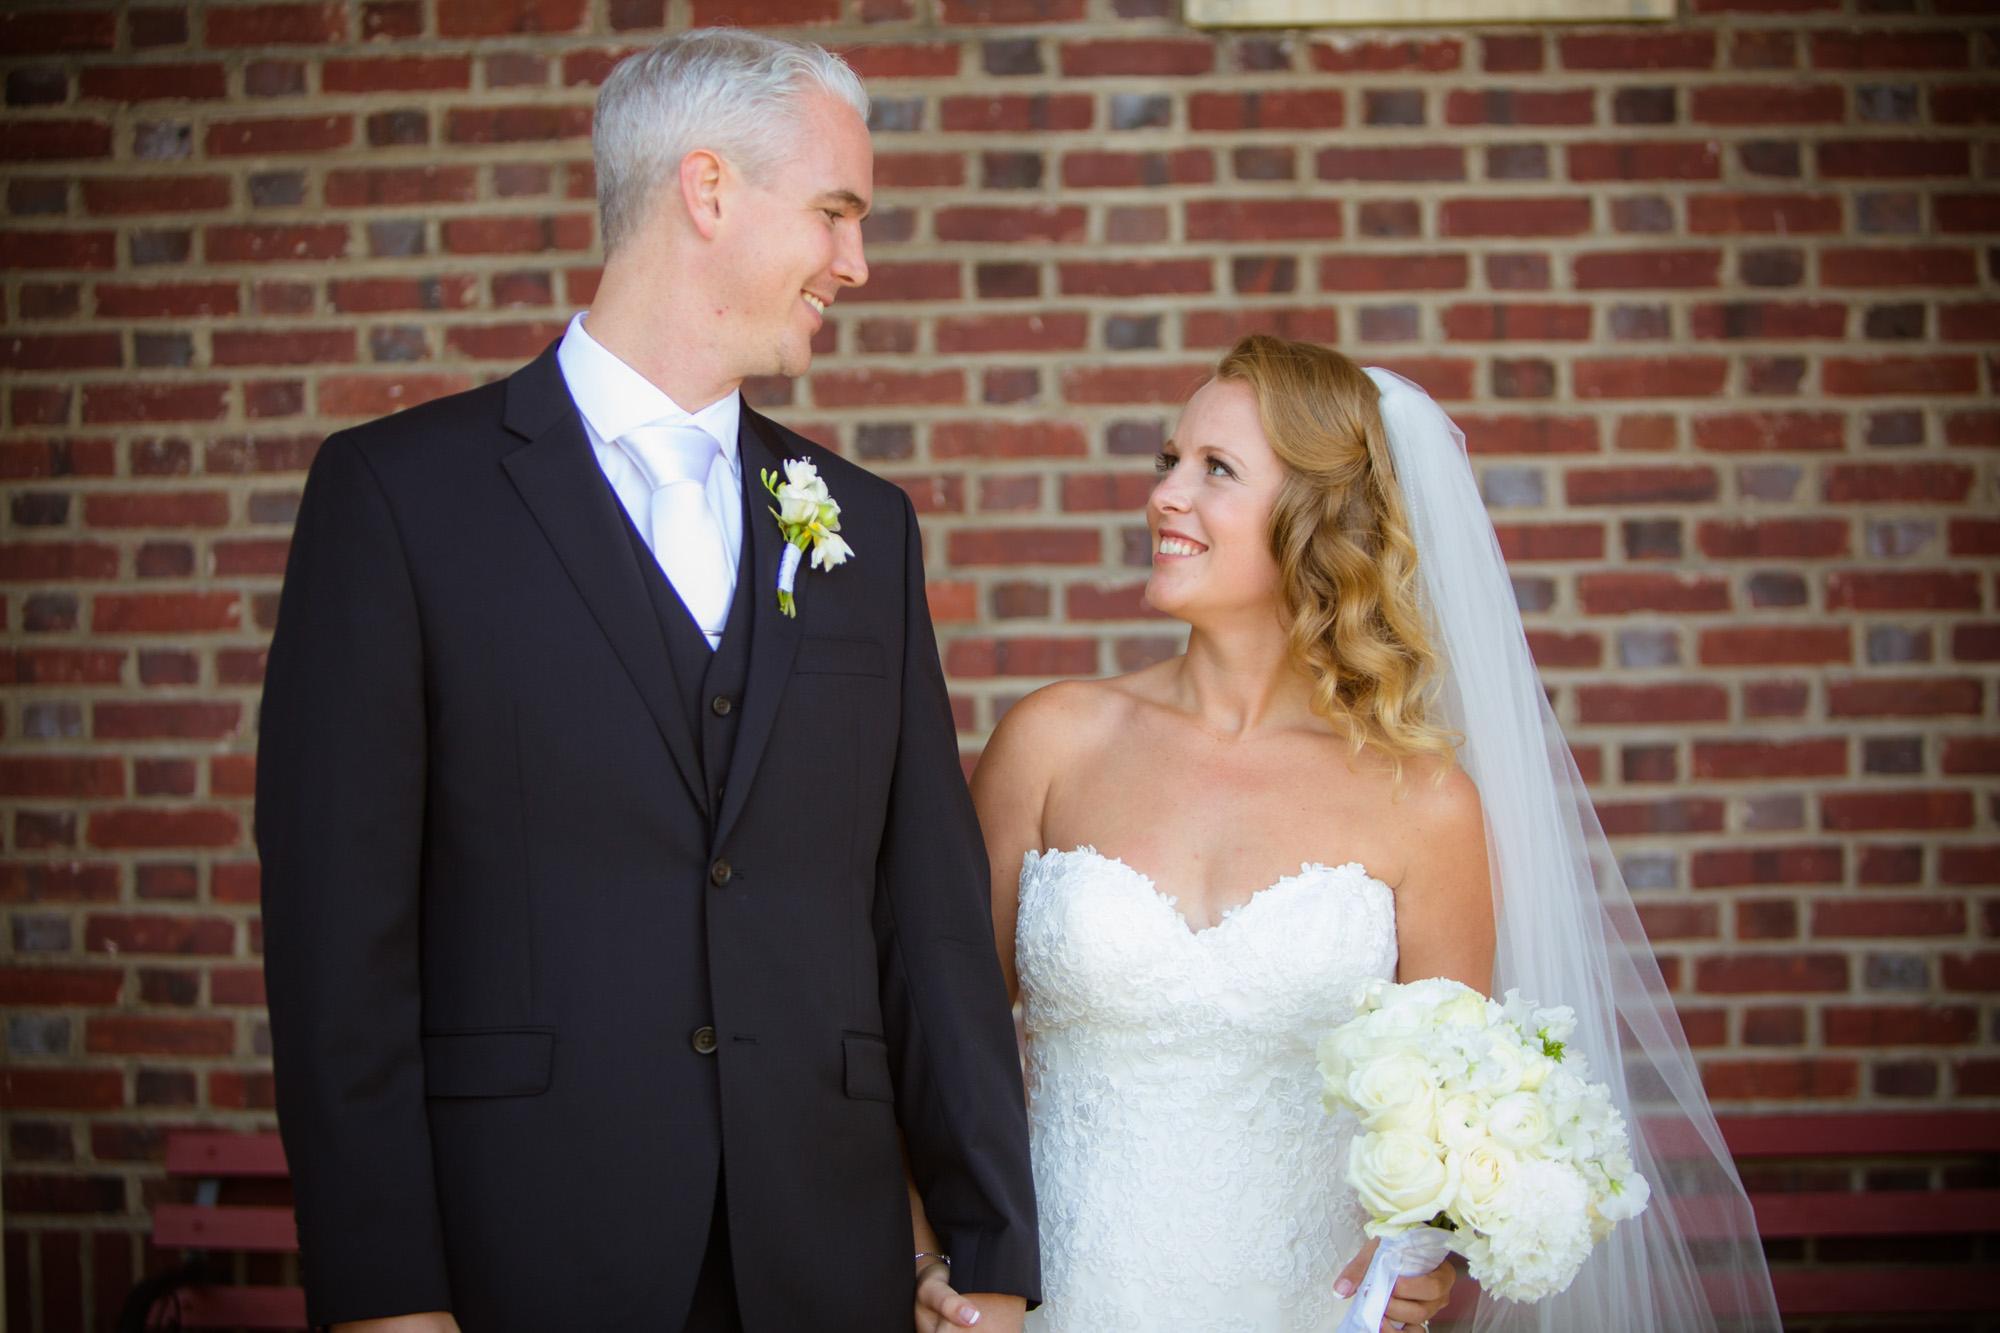 scranton_wedding_photographer_lettieri_pa (11 of 47).jpg